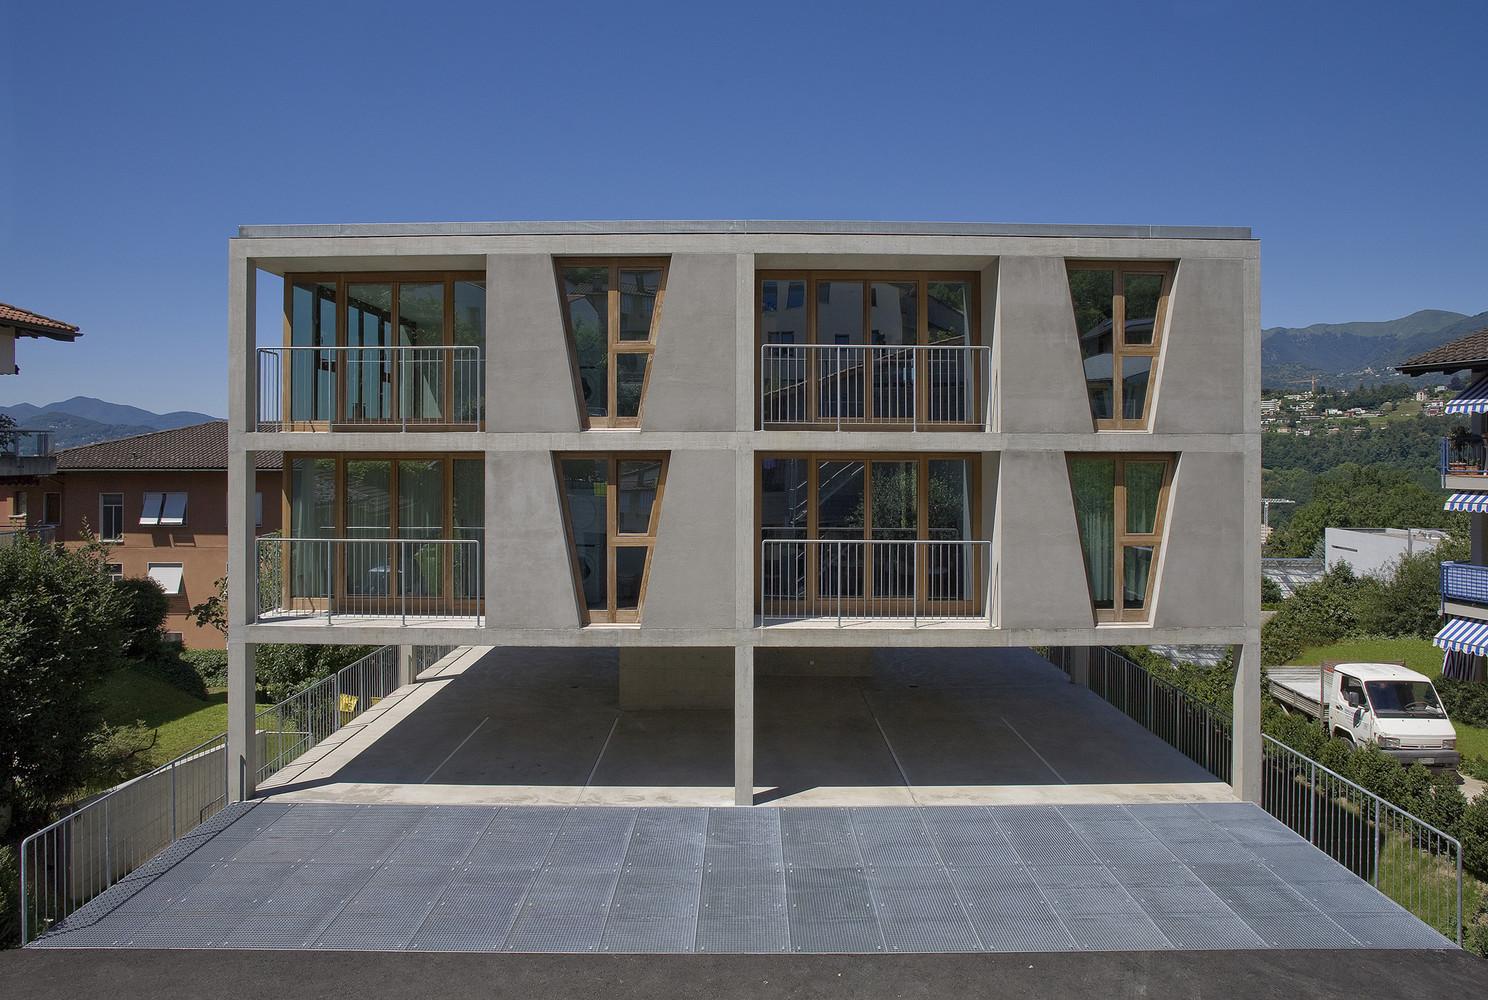 Gallery Of Apartment House In Pregassona  Architetti Pedrozzi - 4 apartment house